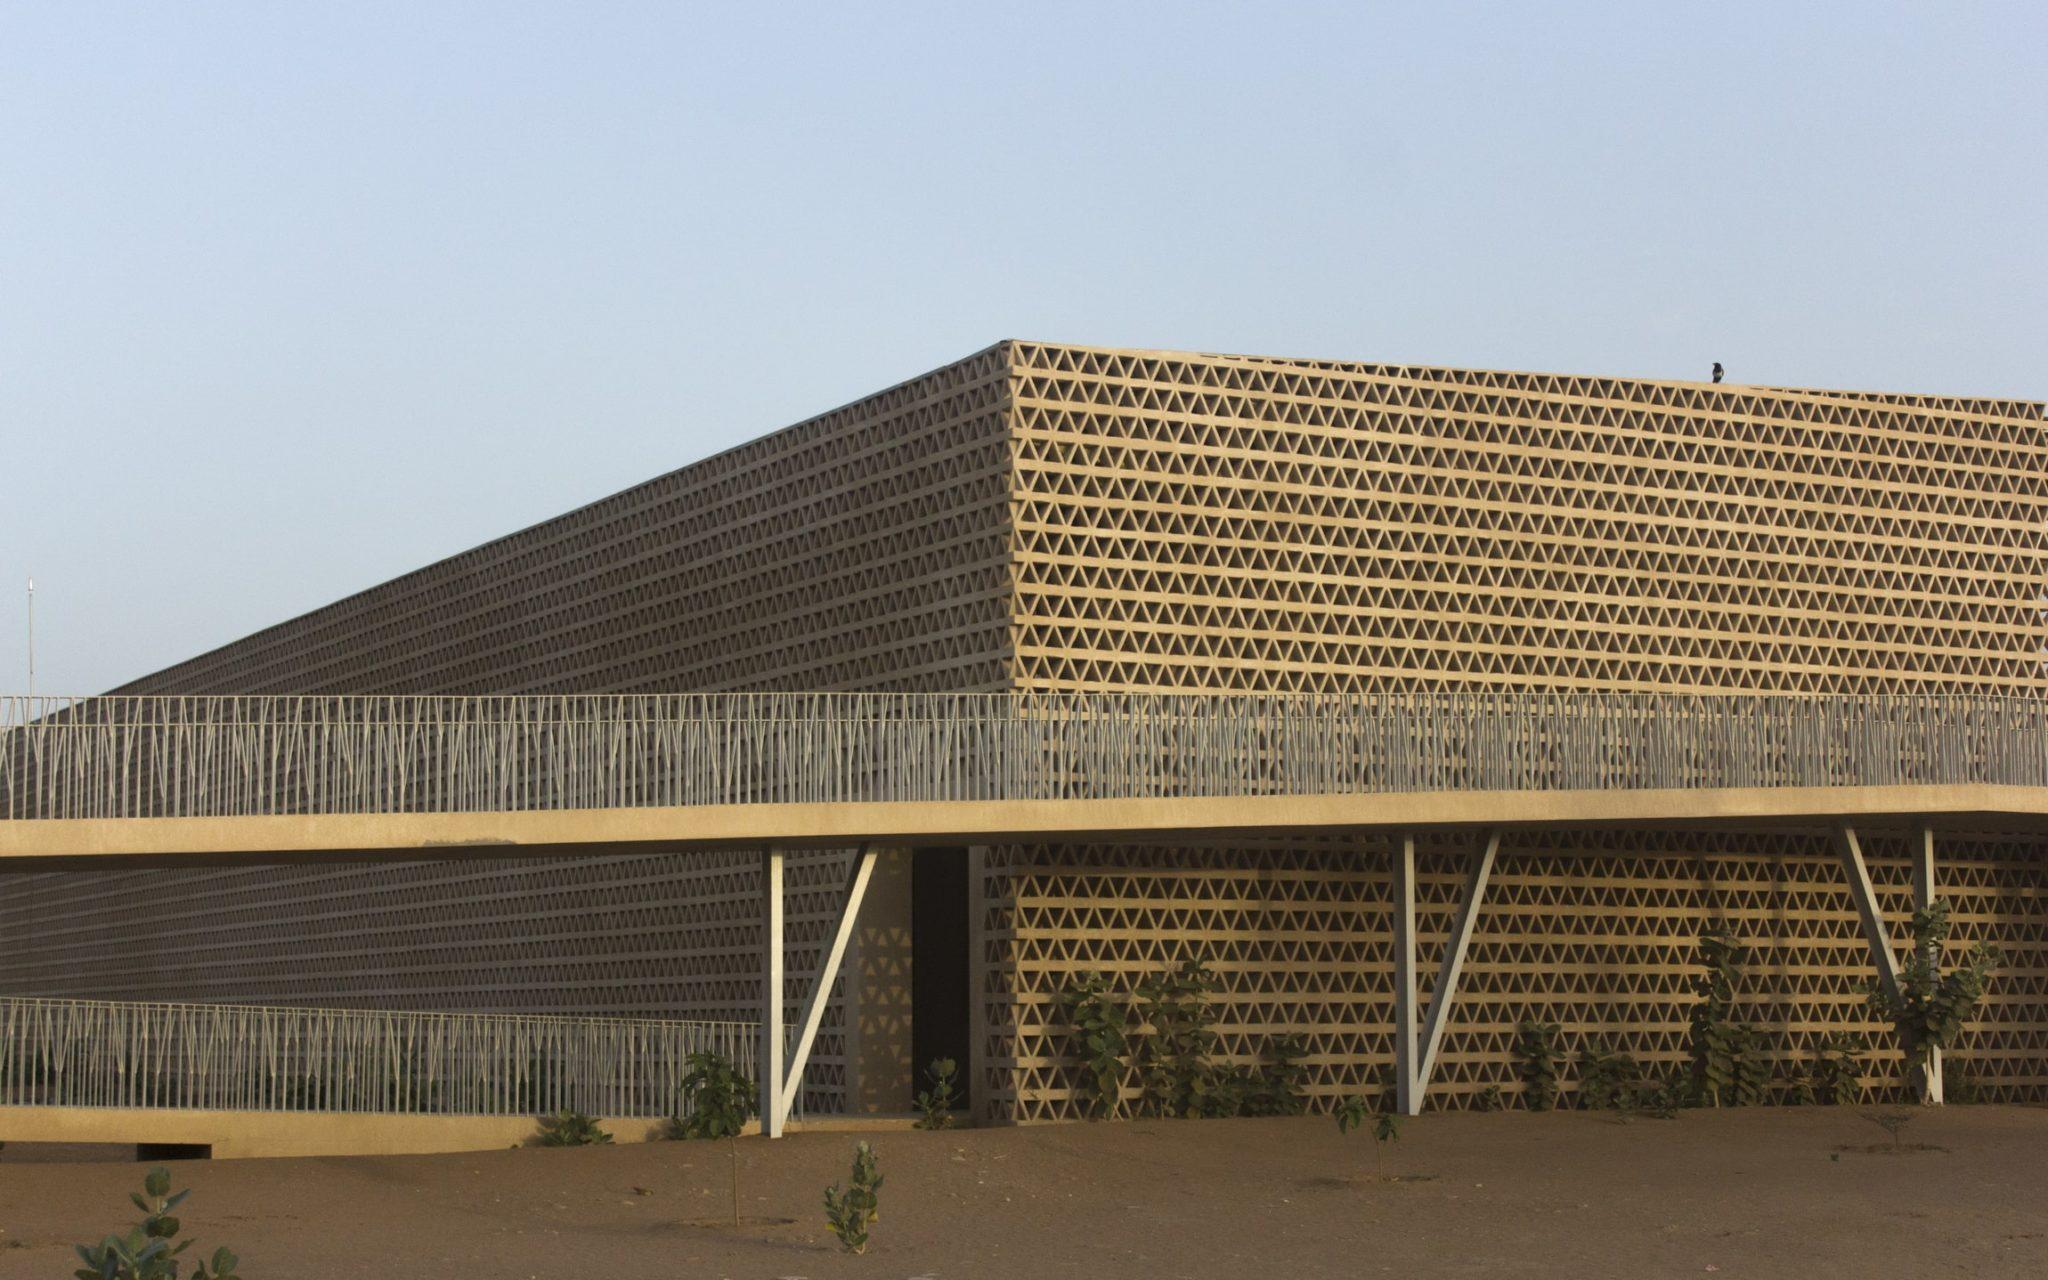 ALIOUNE-DIOP-UNIVERSITY-LECTURE-BUILDINGنامزد جایزه معماری آقاخان 2019 پروژه